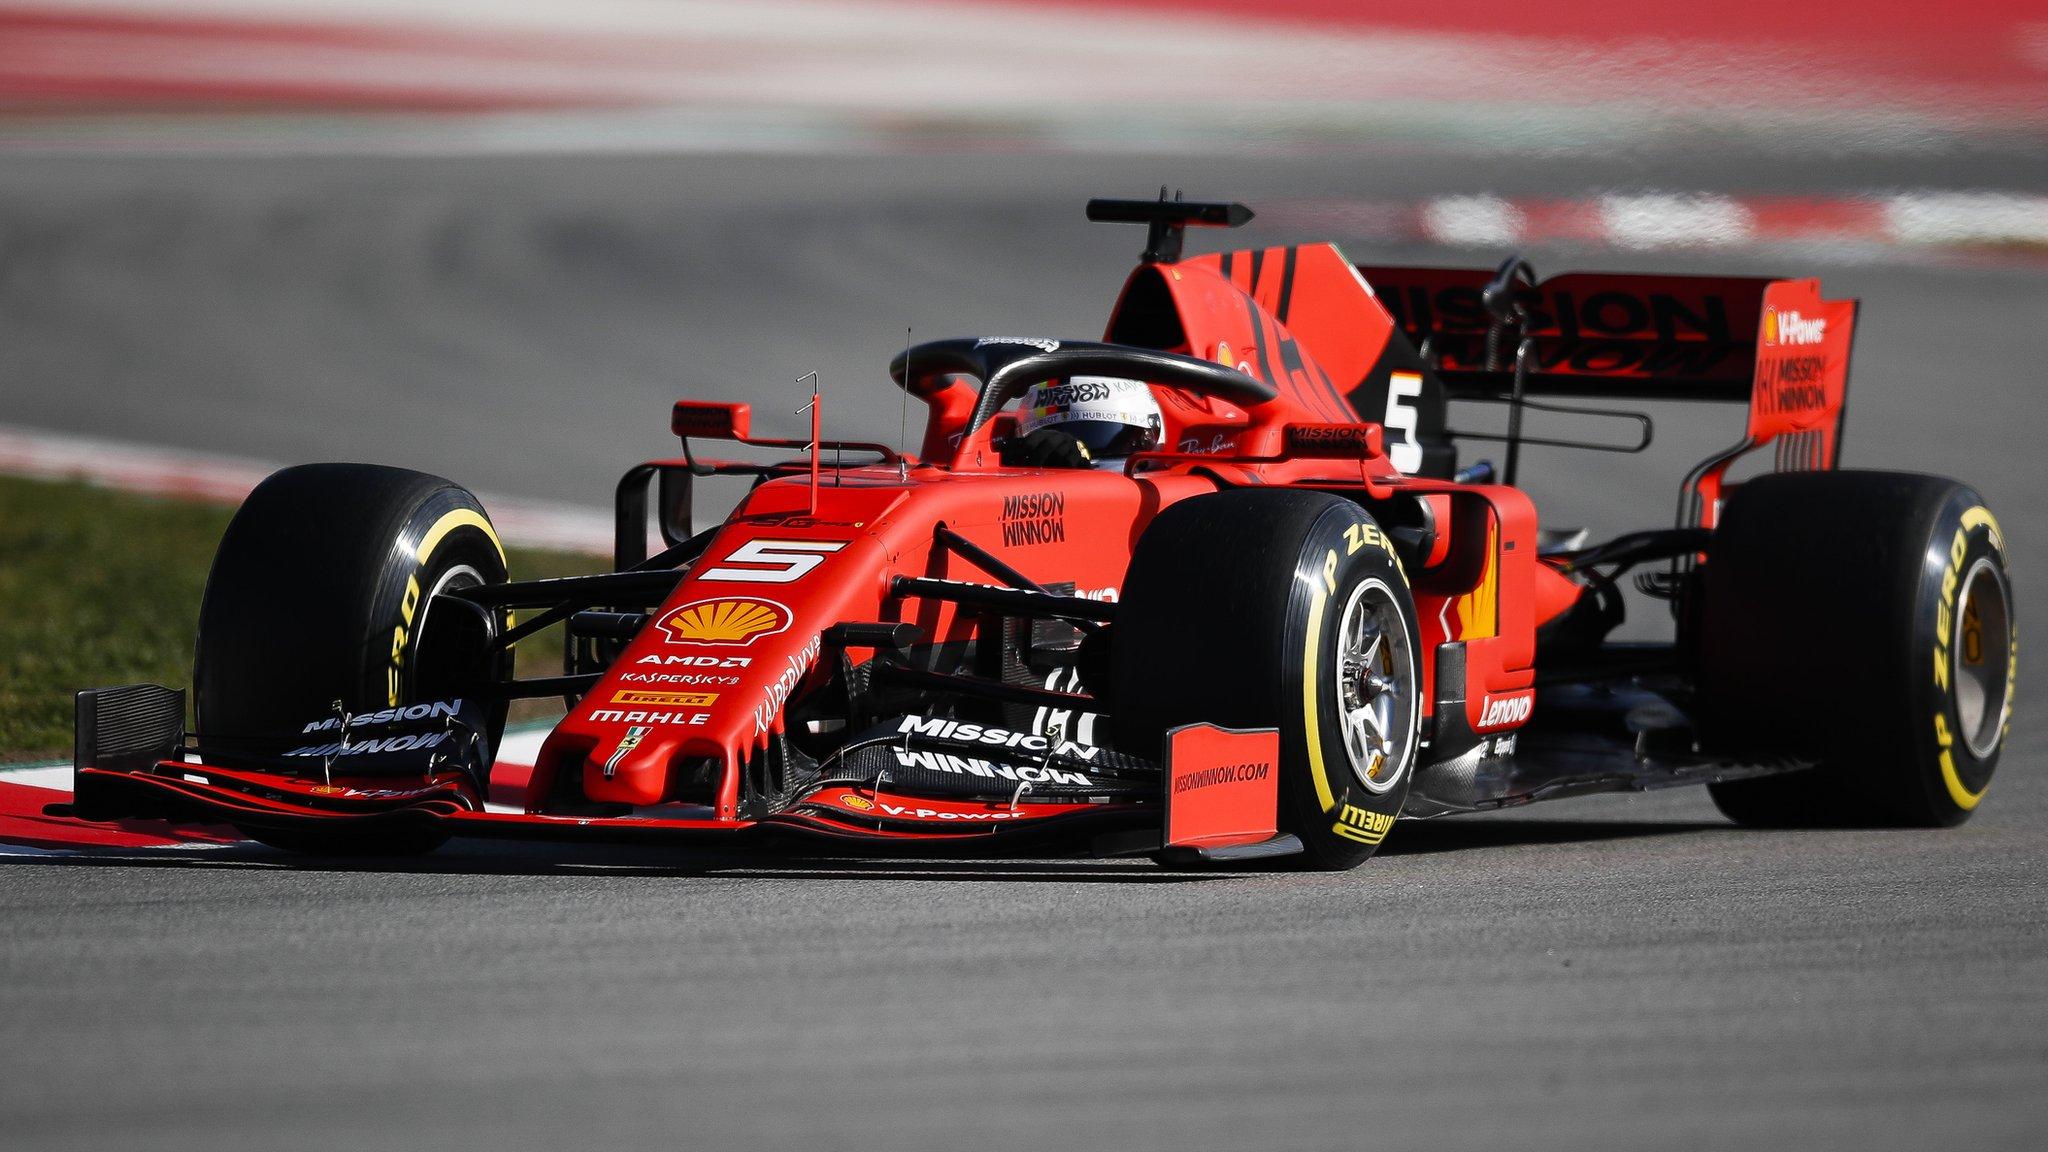 Formula 1 testing 2019: Williams in turmoil as Sebastian Vettel fastest